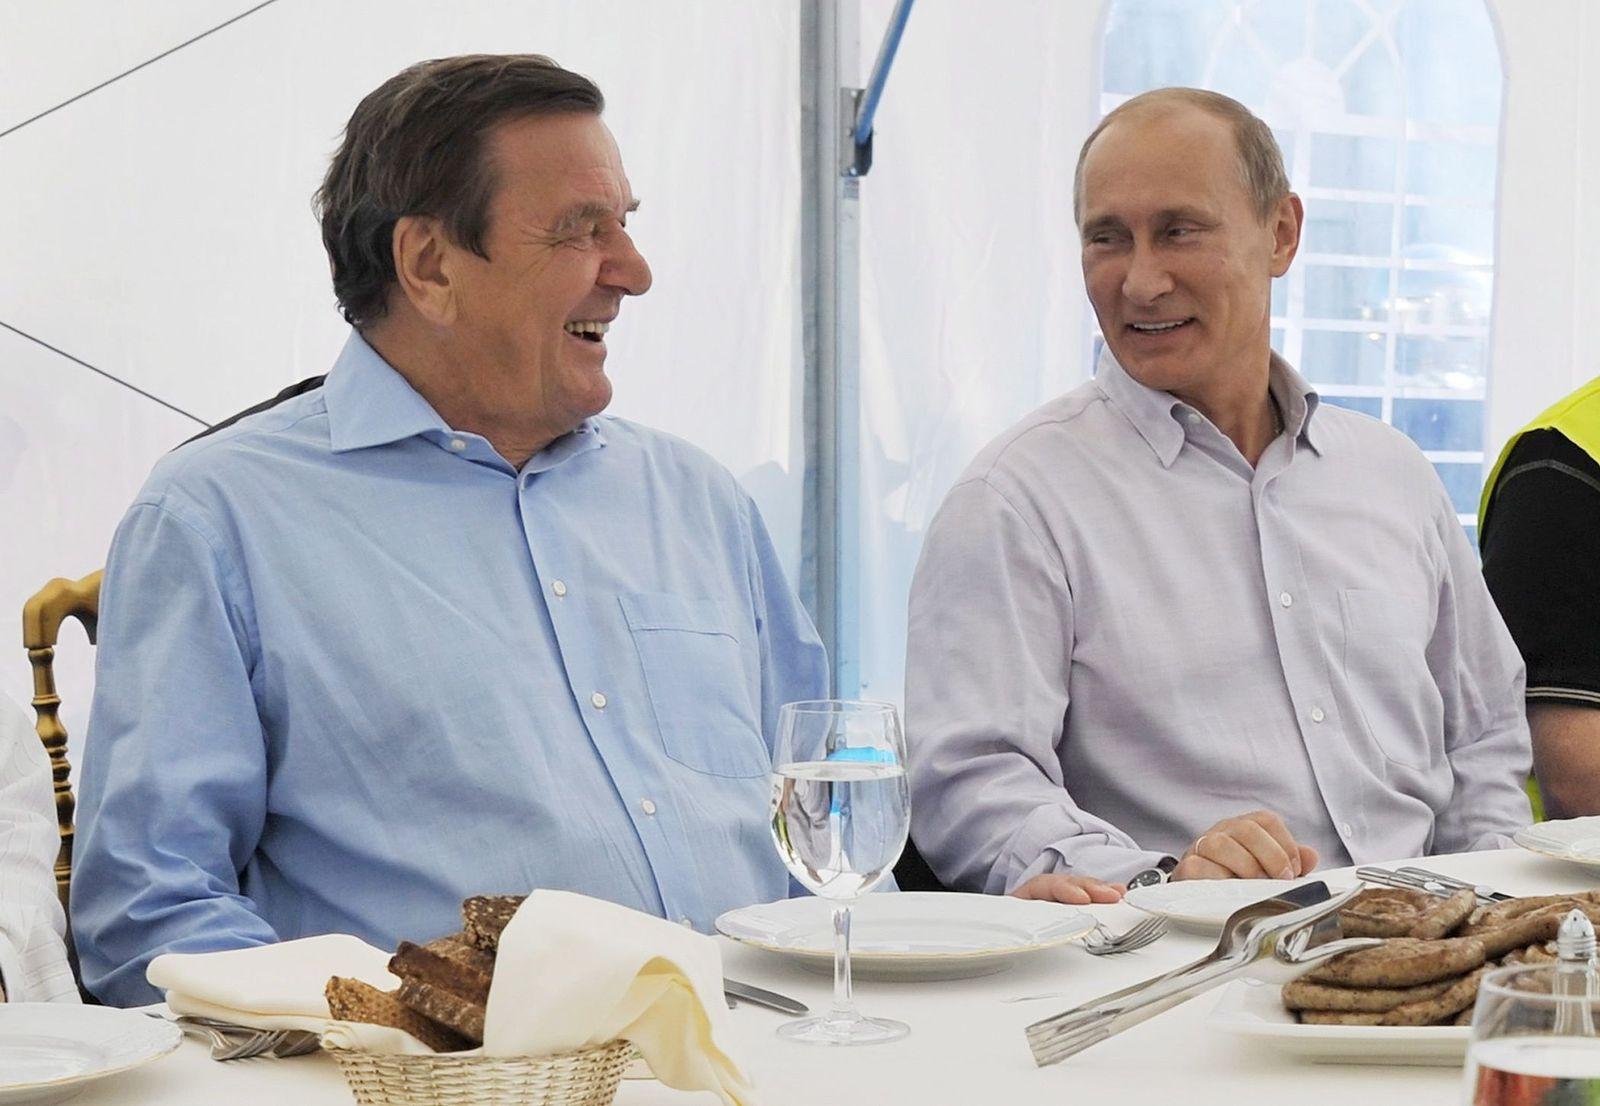 Putin/ Schröder